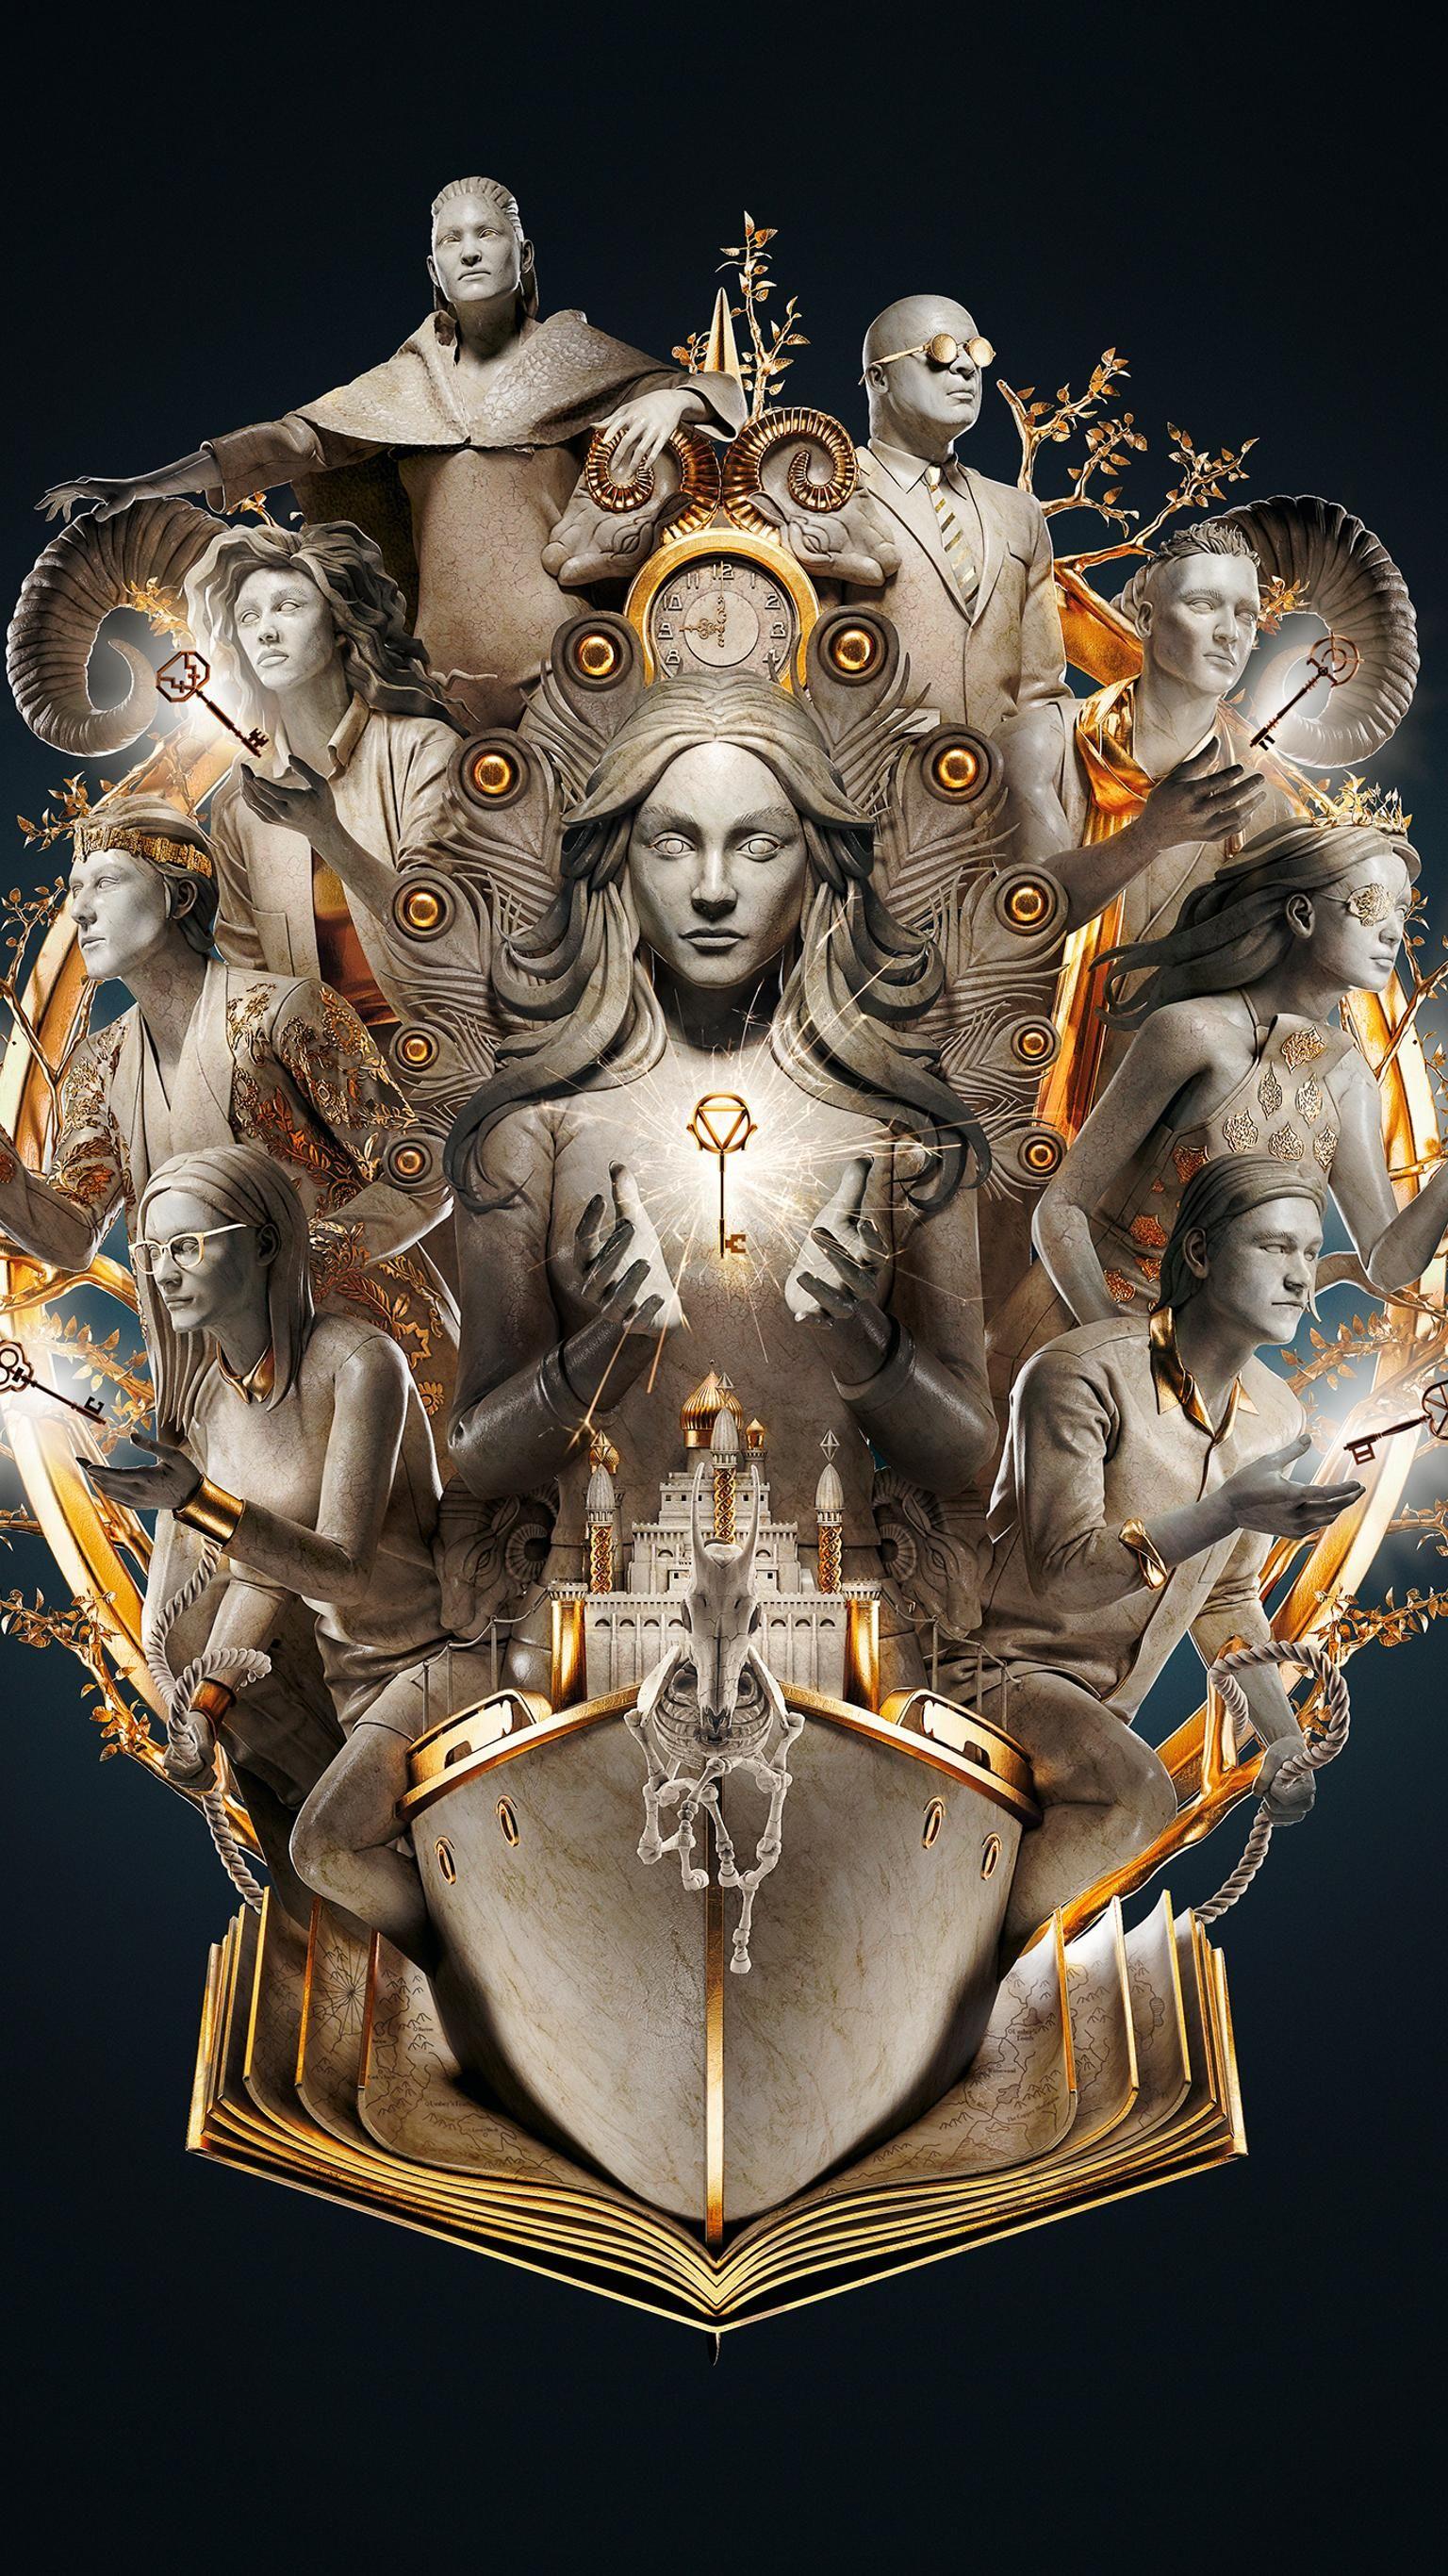 Moviemania Textless High Resolution Movie Wallpapers The Magicians The Magicians Syfy Magician Art